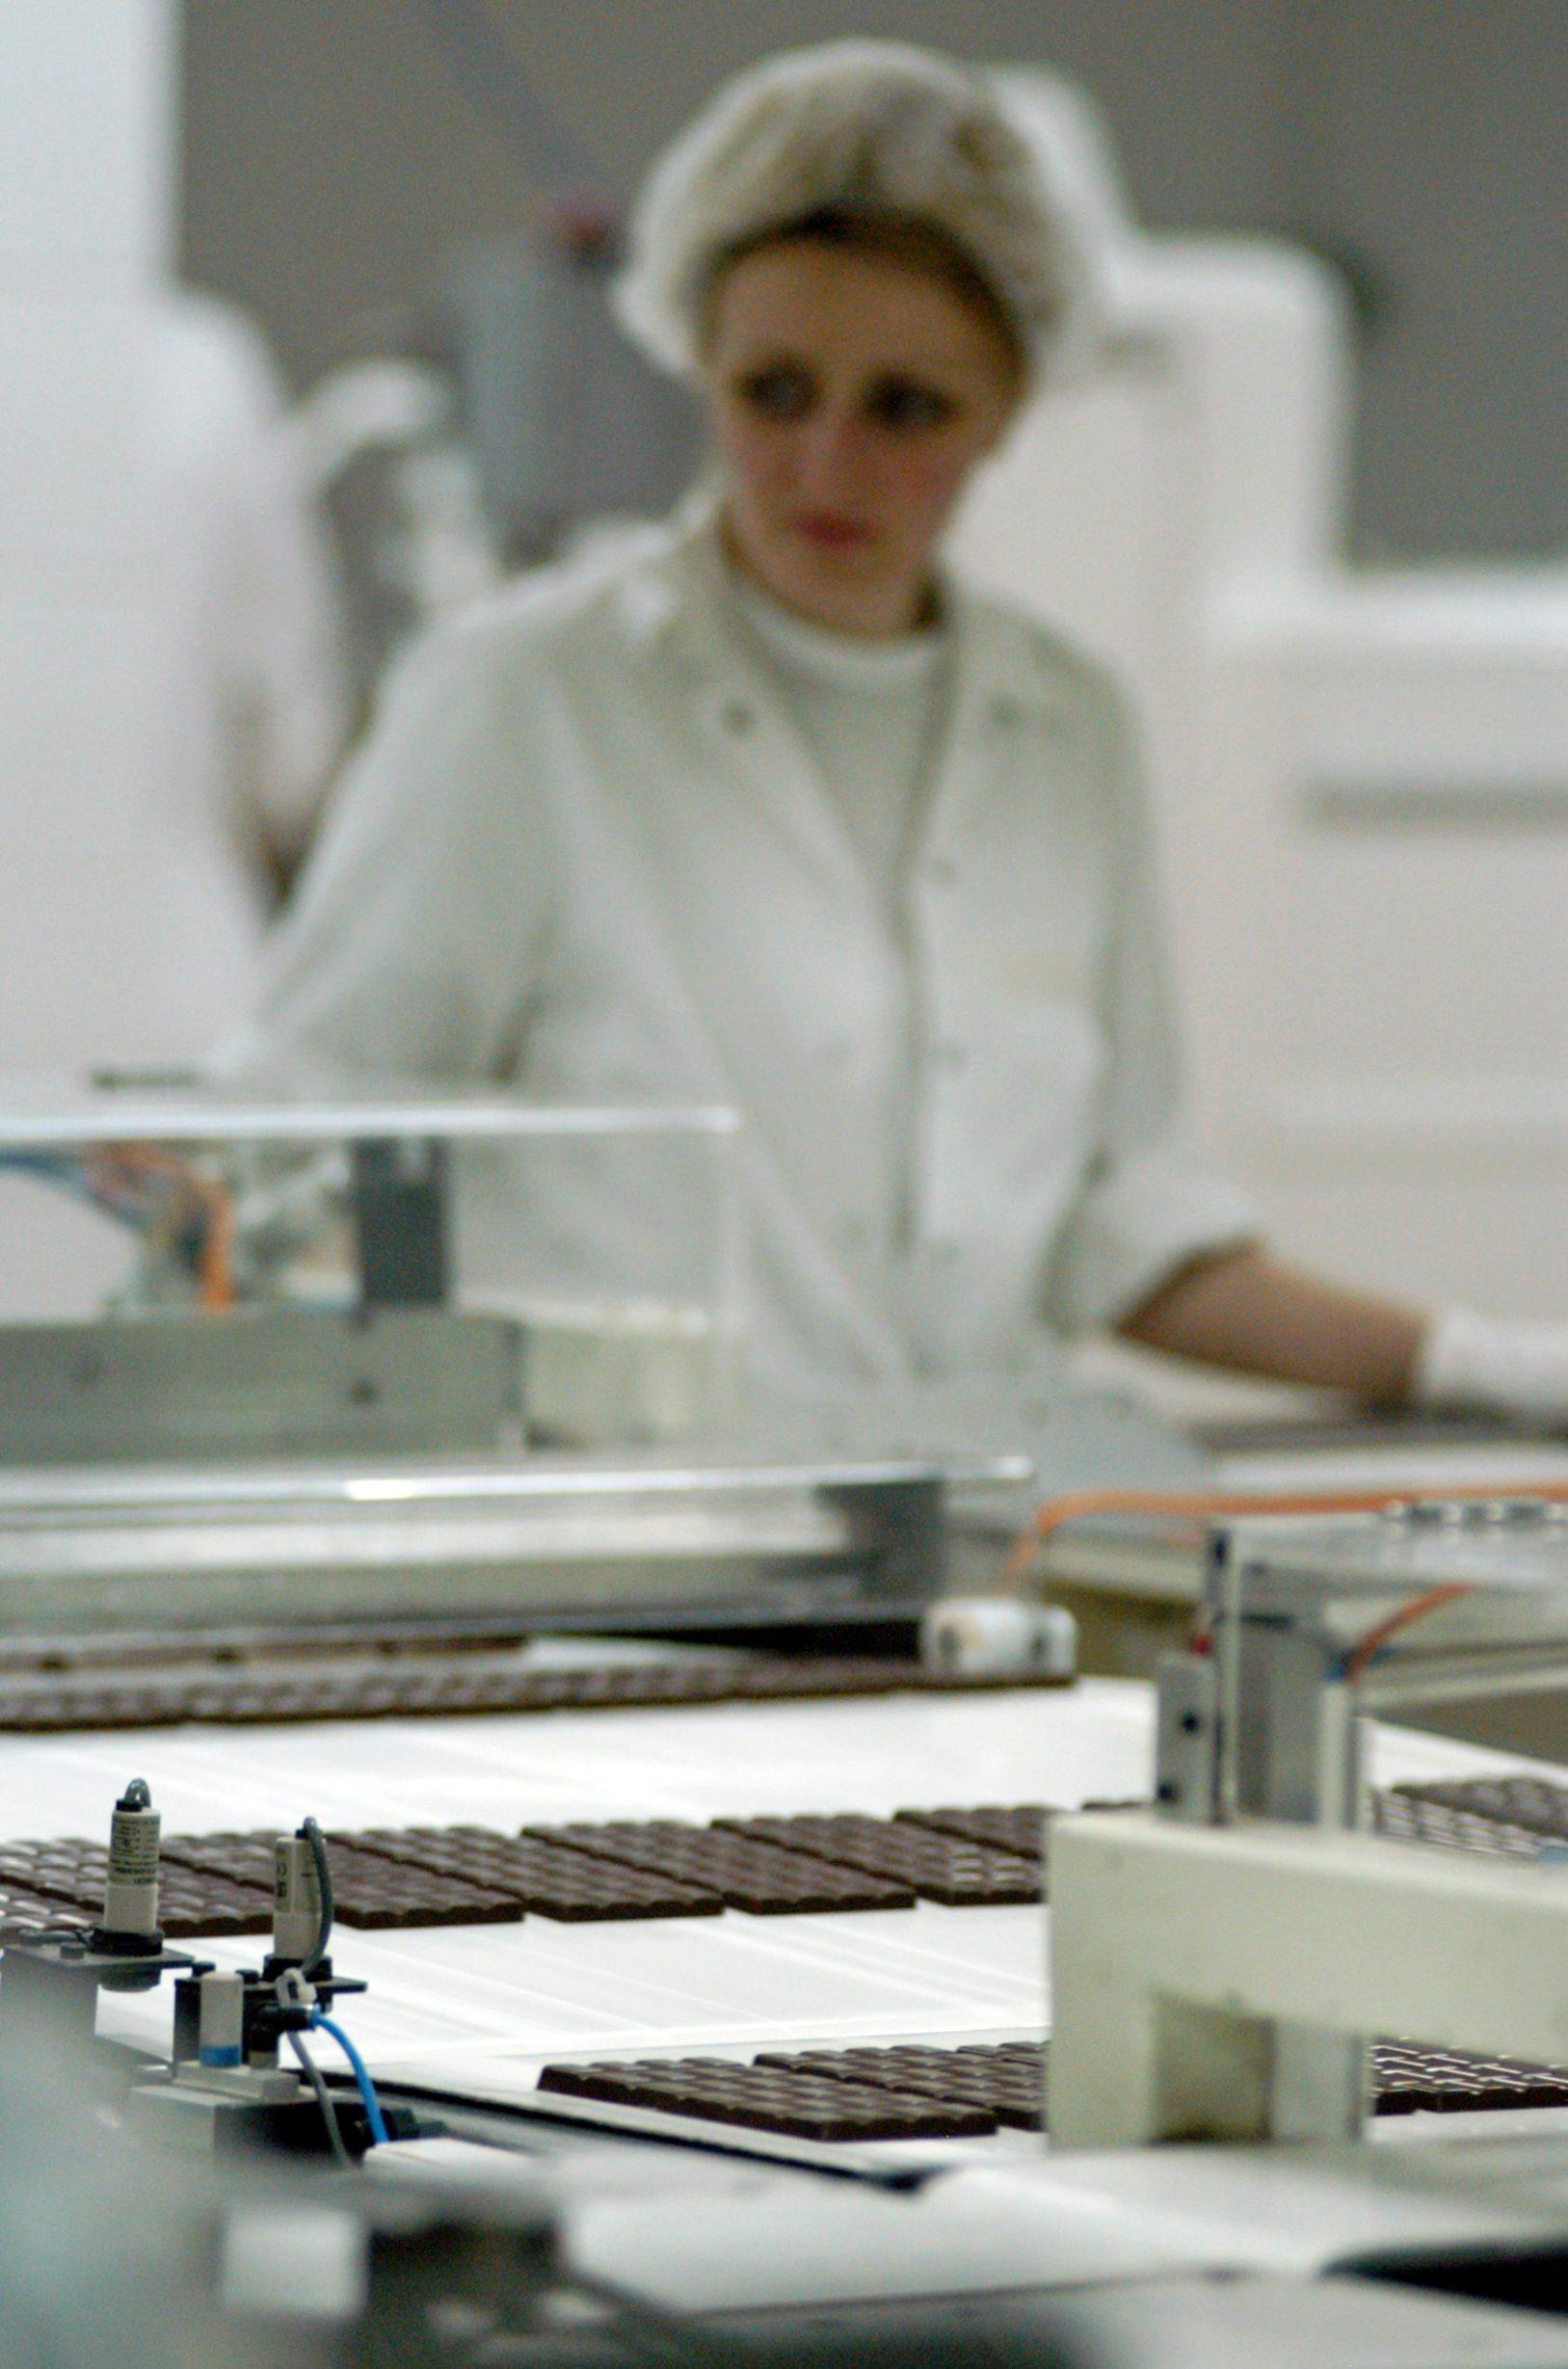 Tvornica čokolade Zvečevo